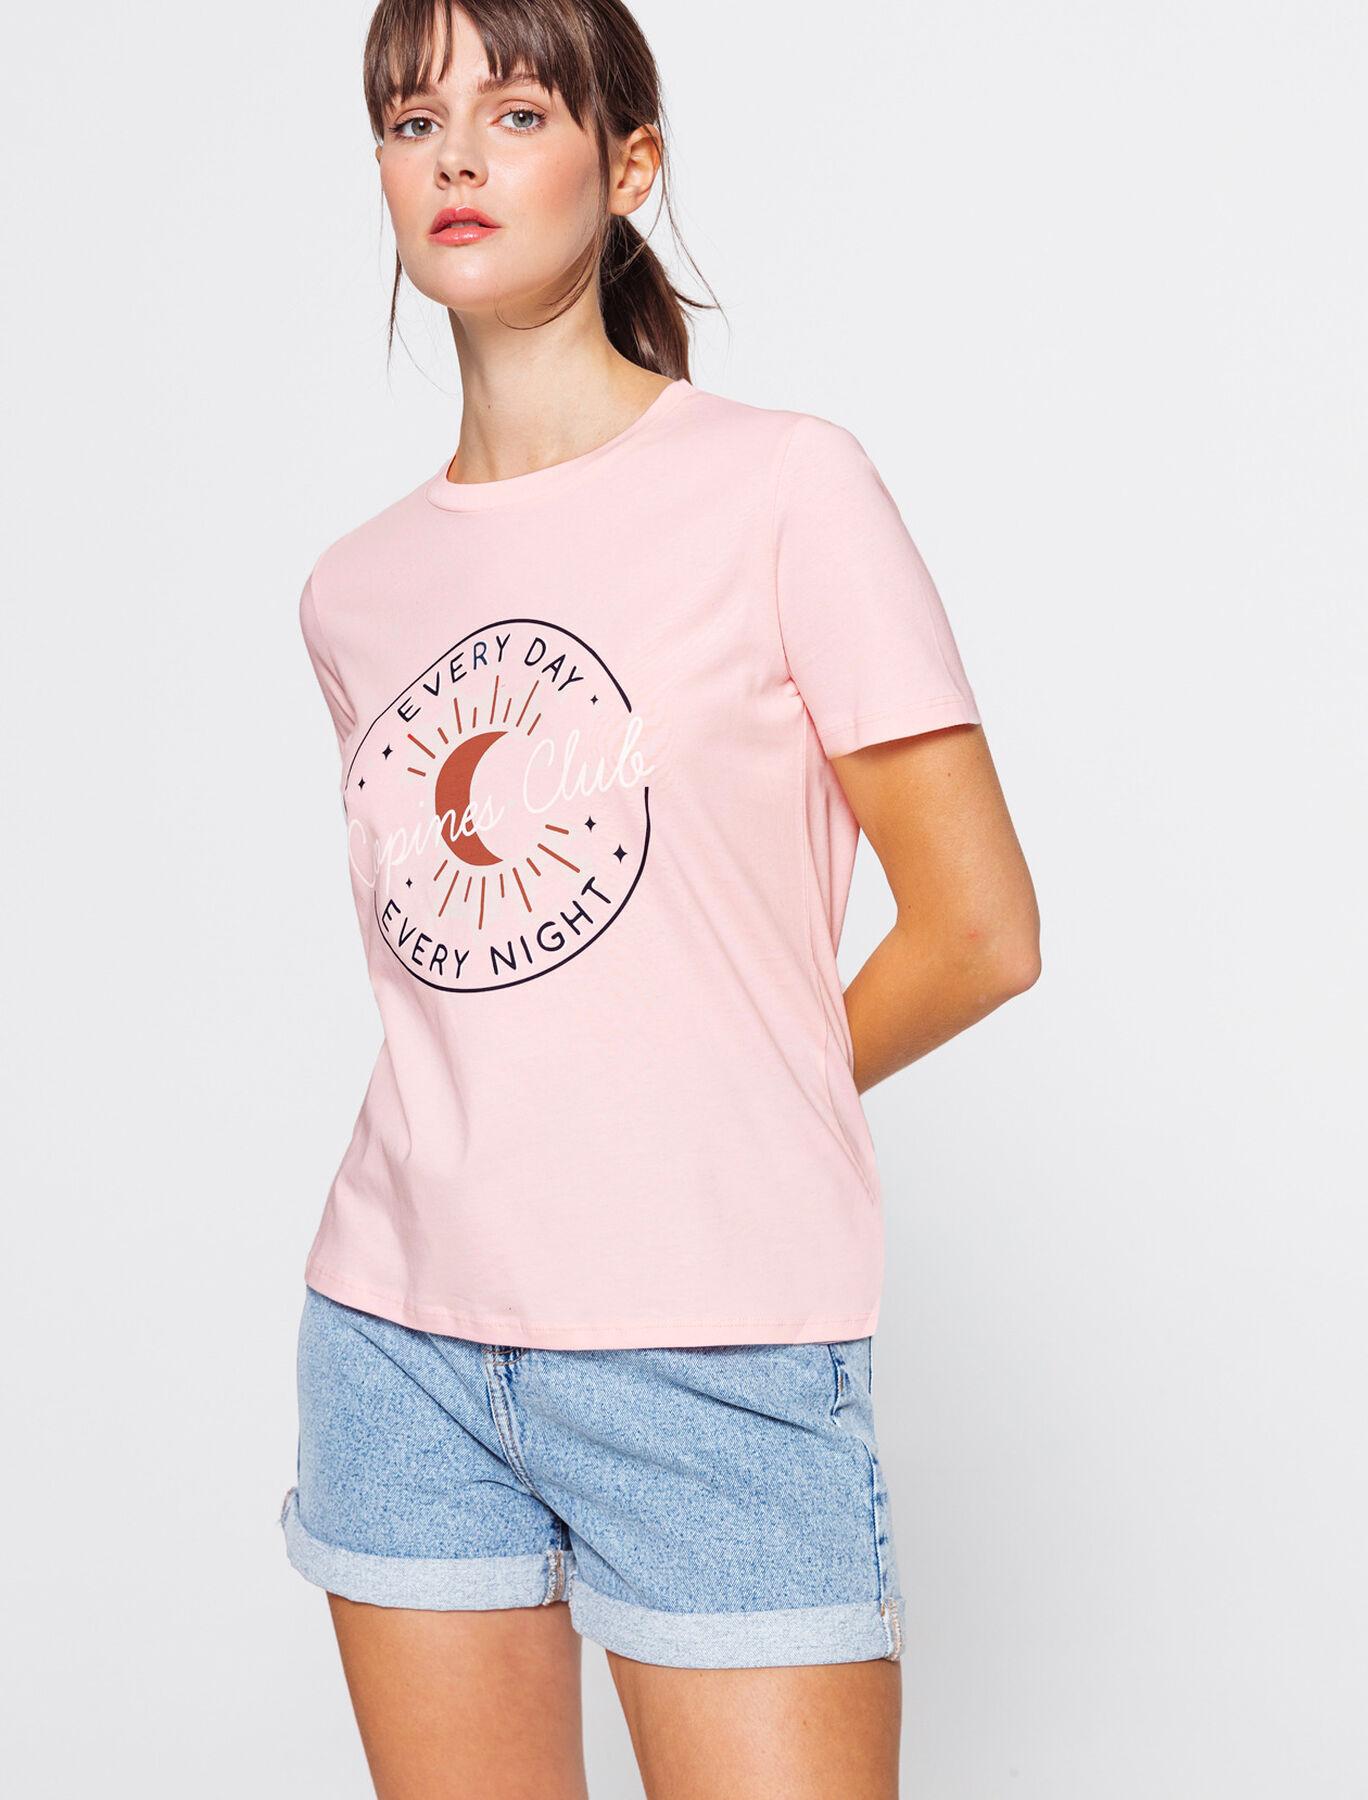 T-shirt copines club